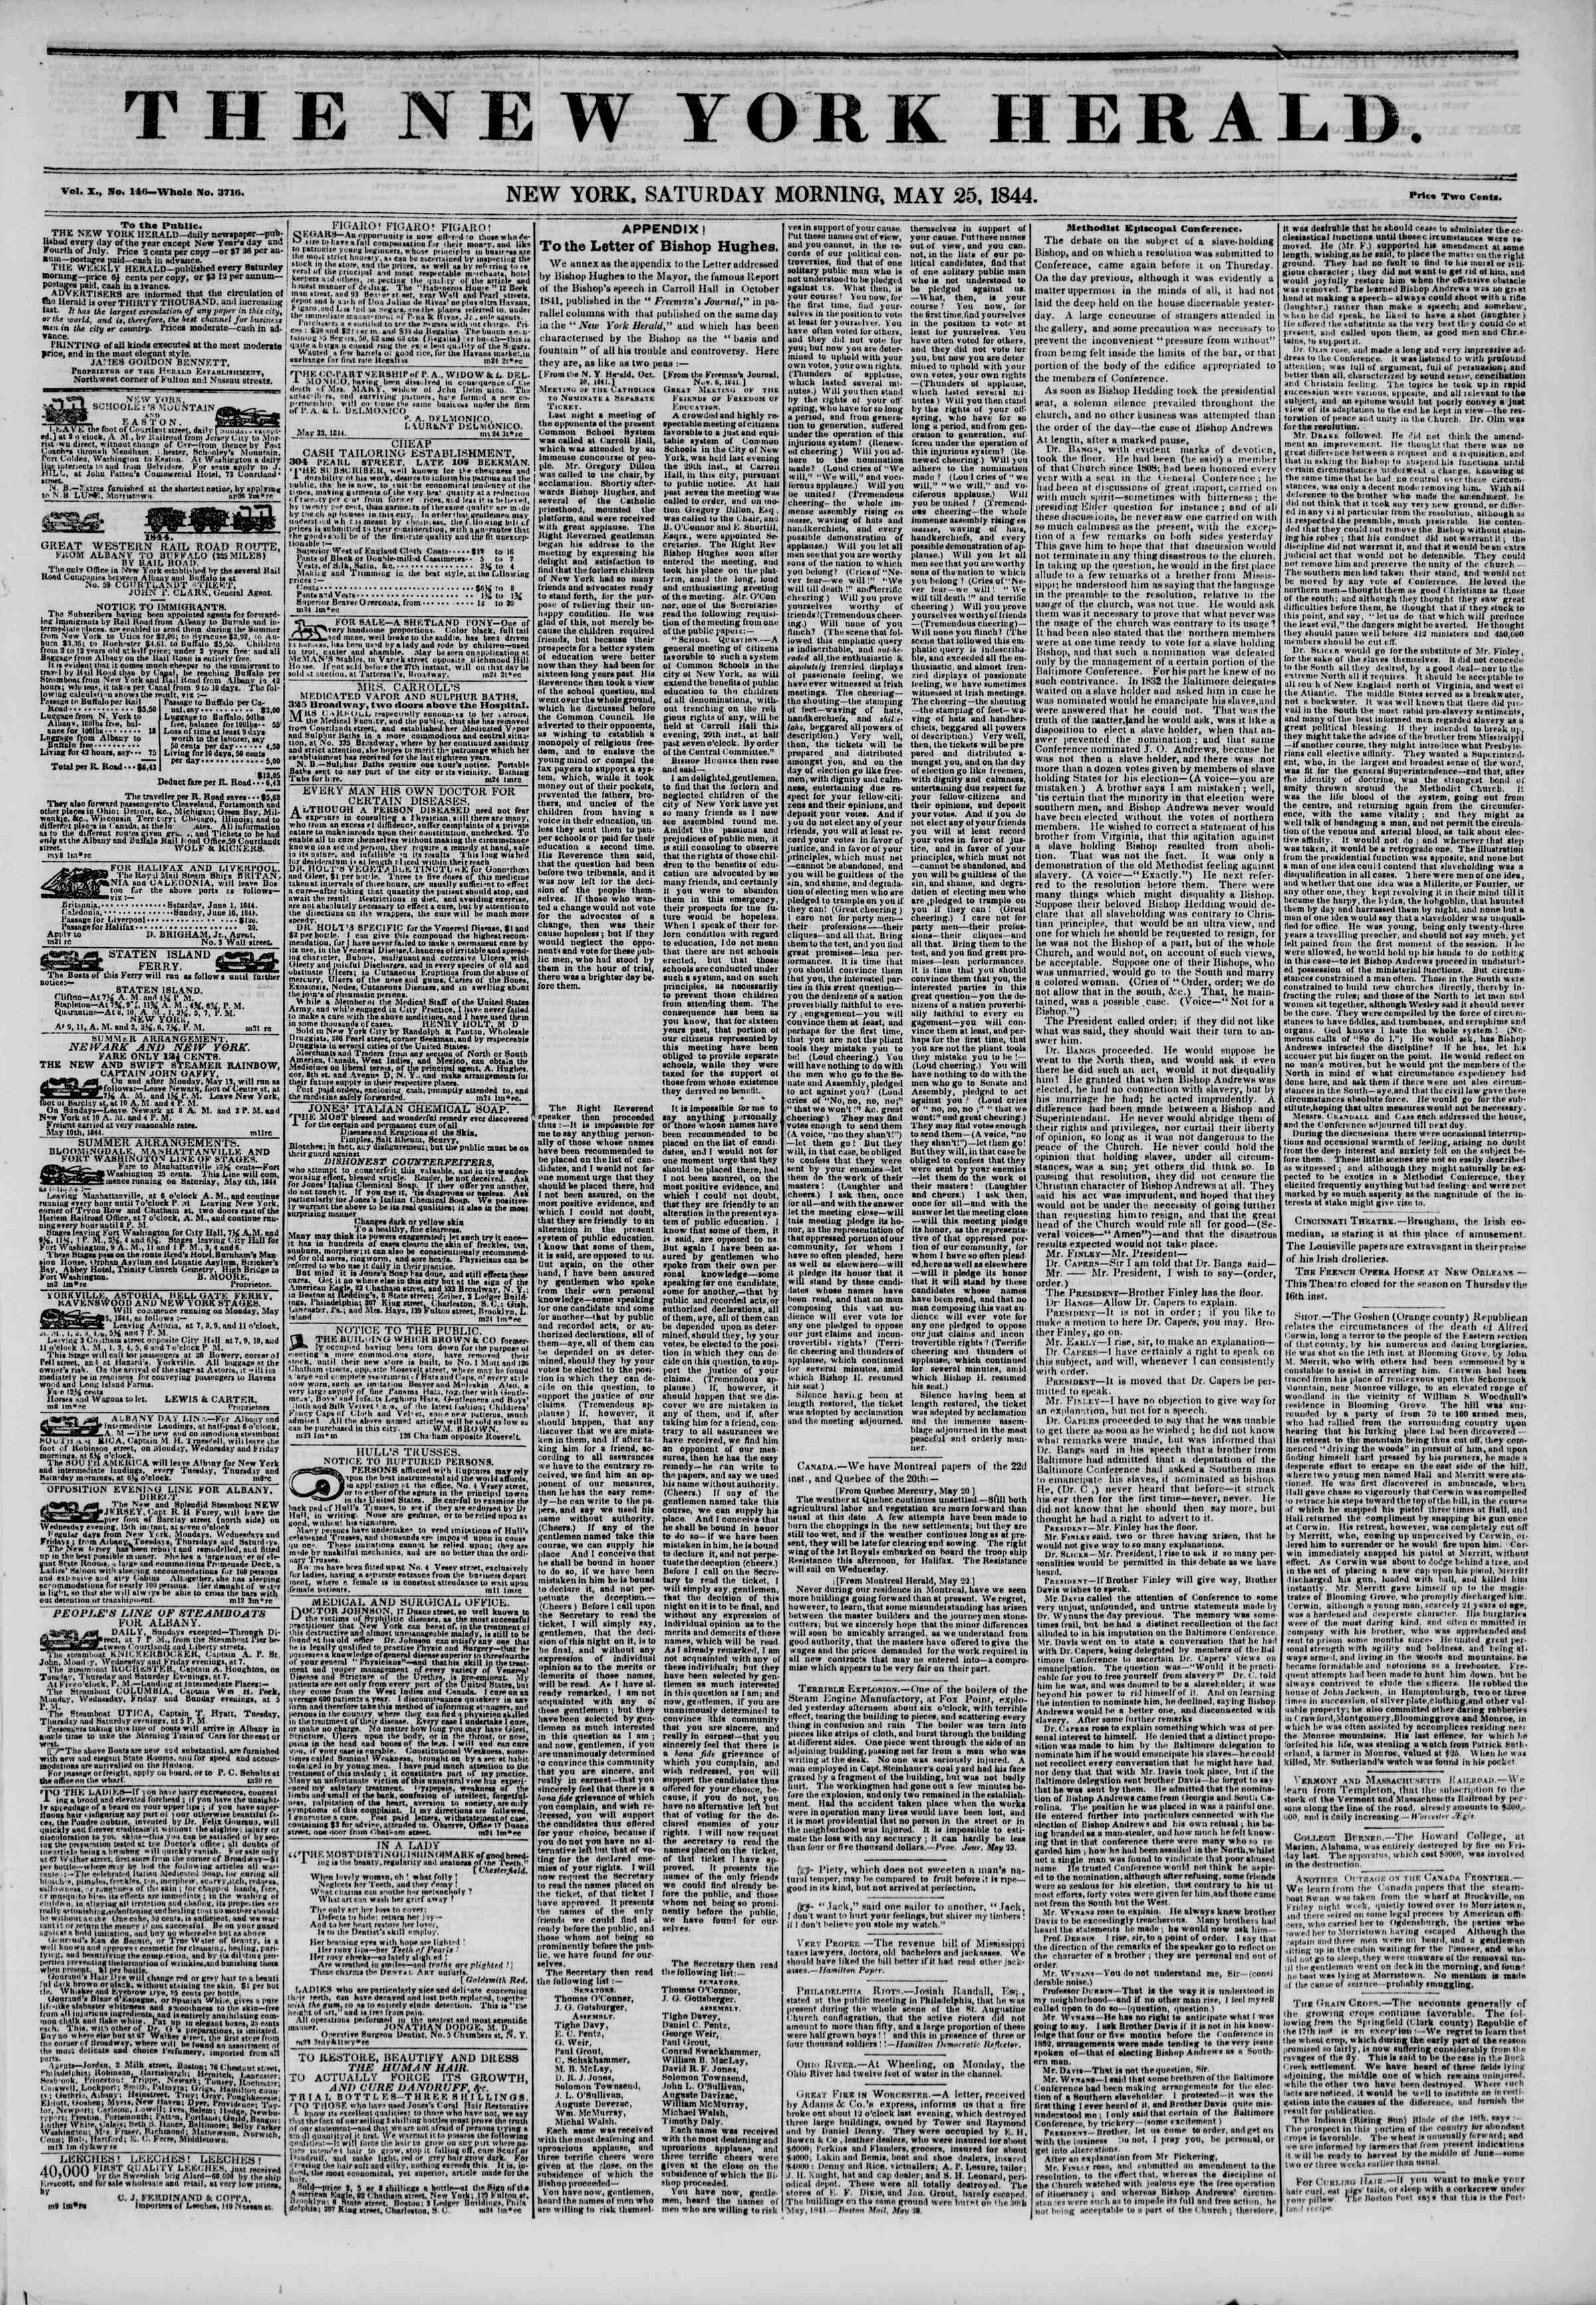 May 25, 1844 Tarihli The New York Herald Gazetesi Sayfa 1